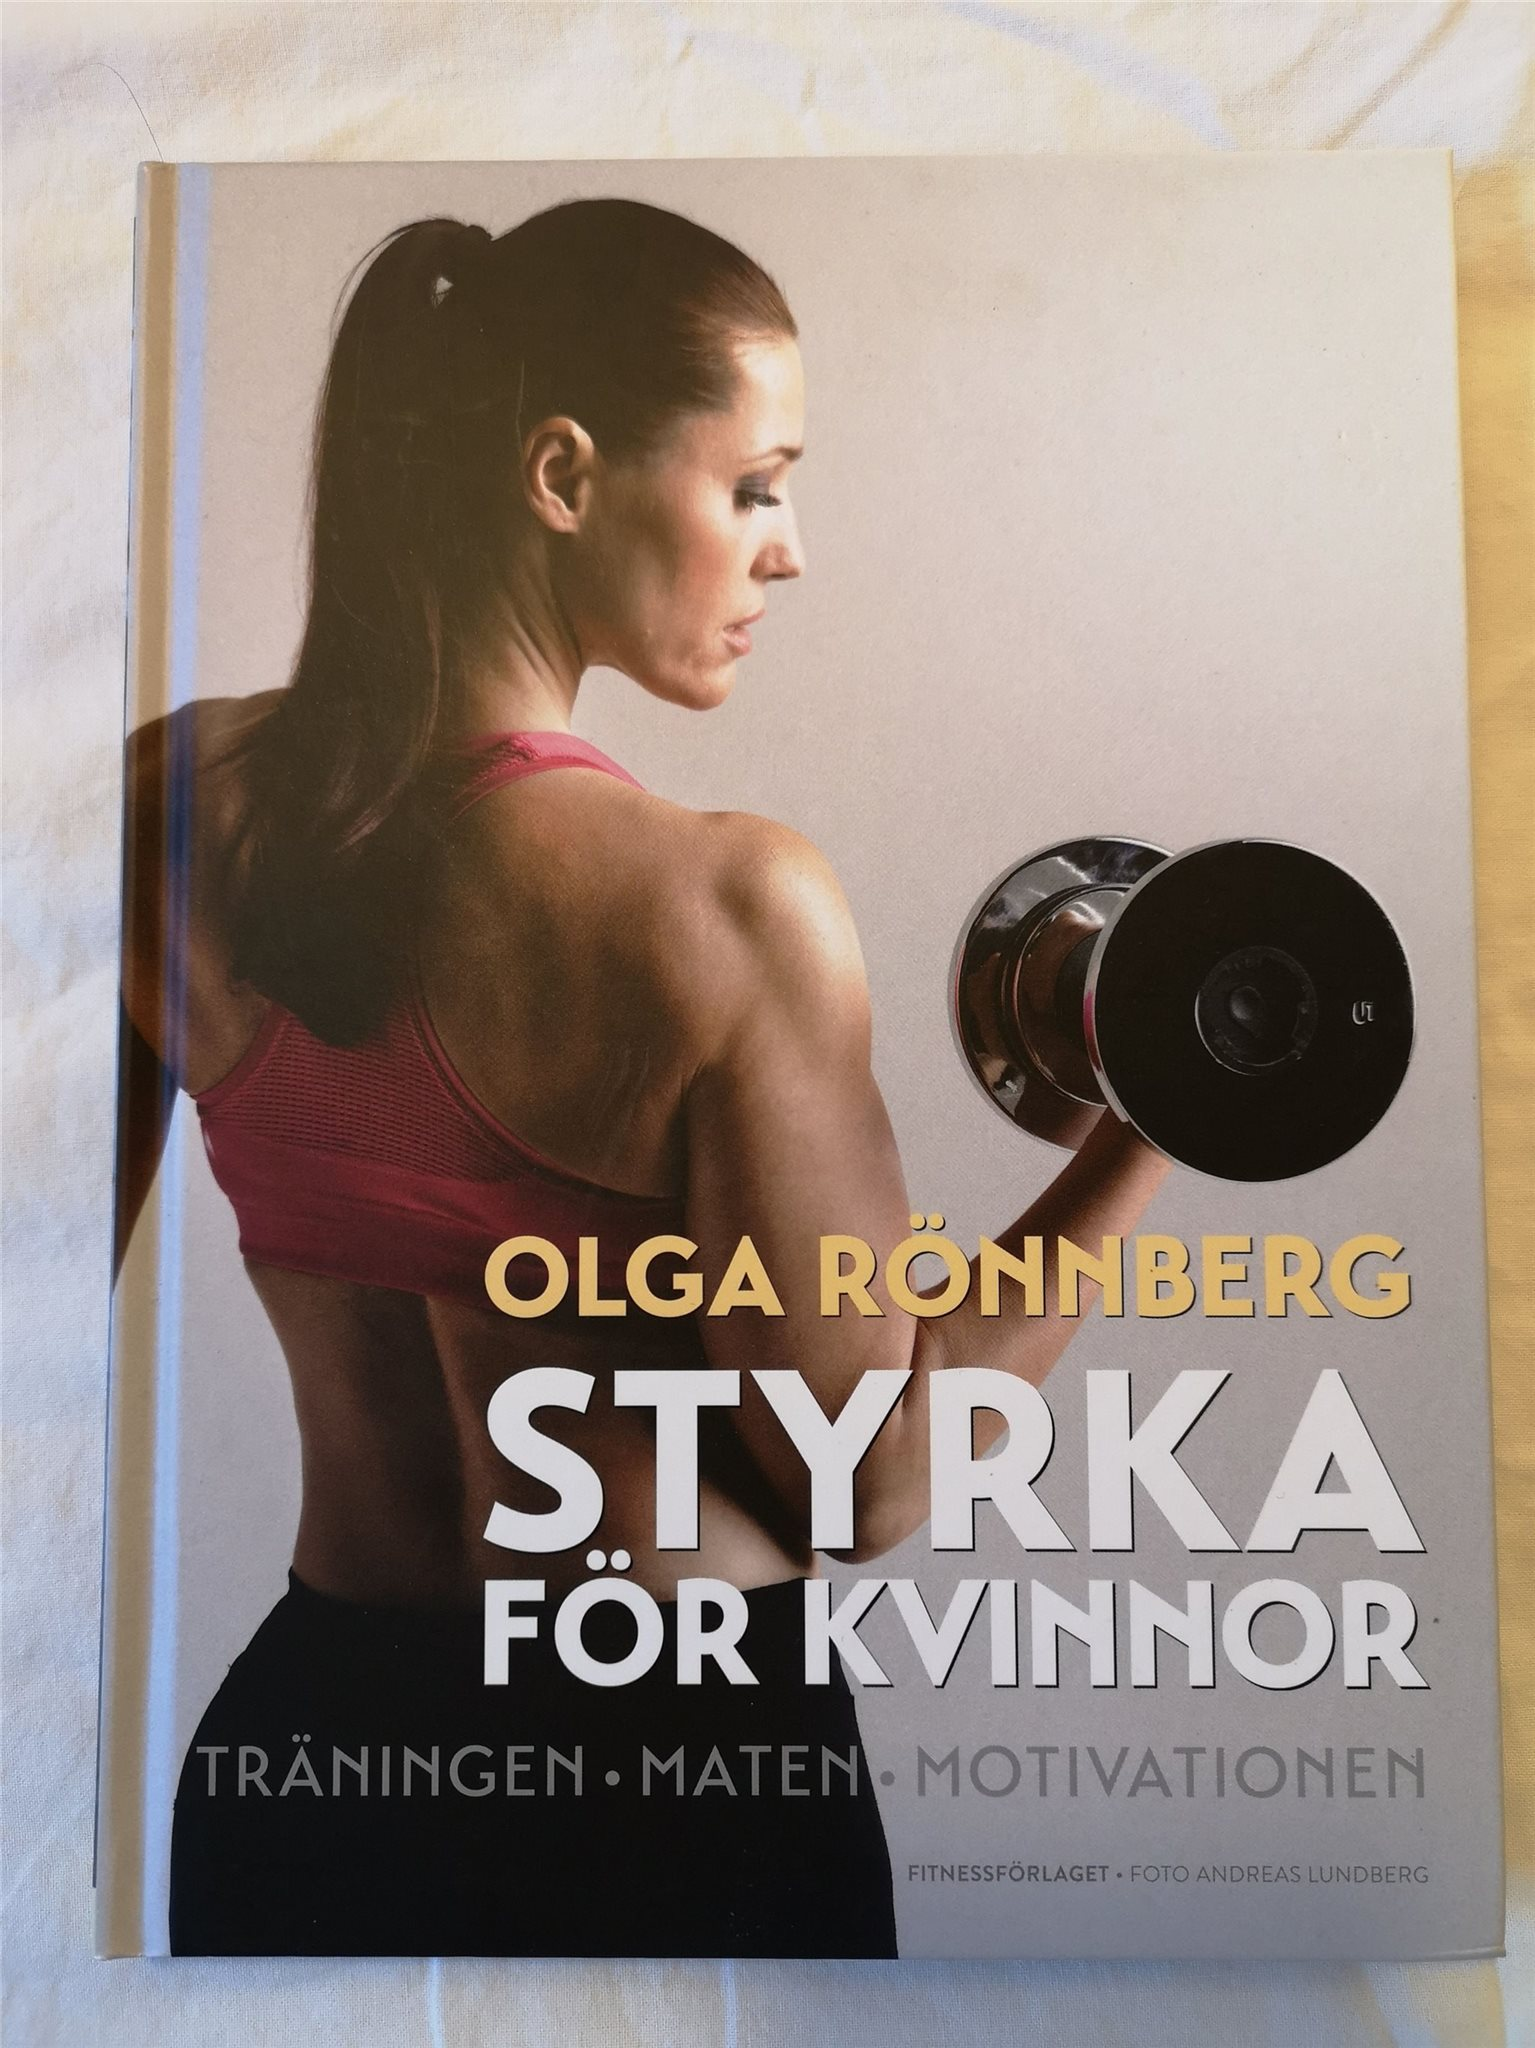 olga rönnberg dvd